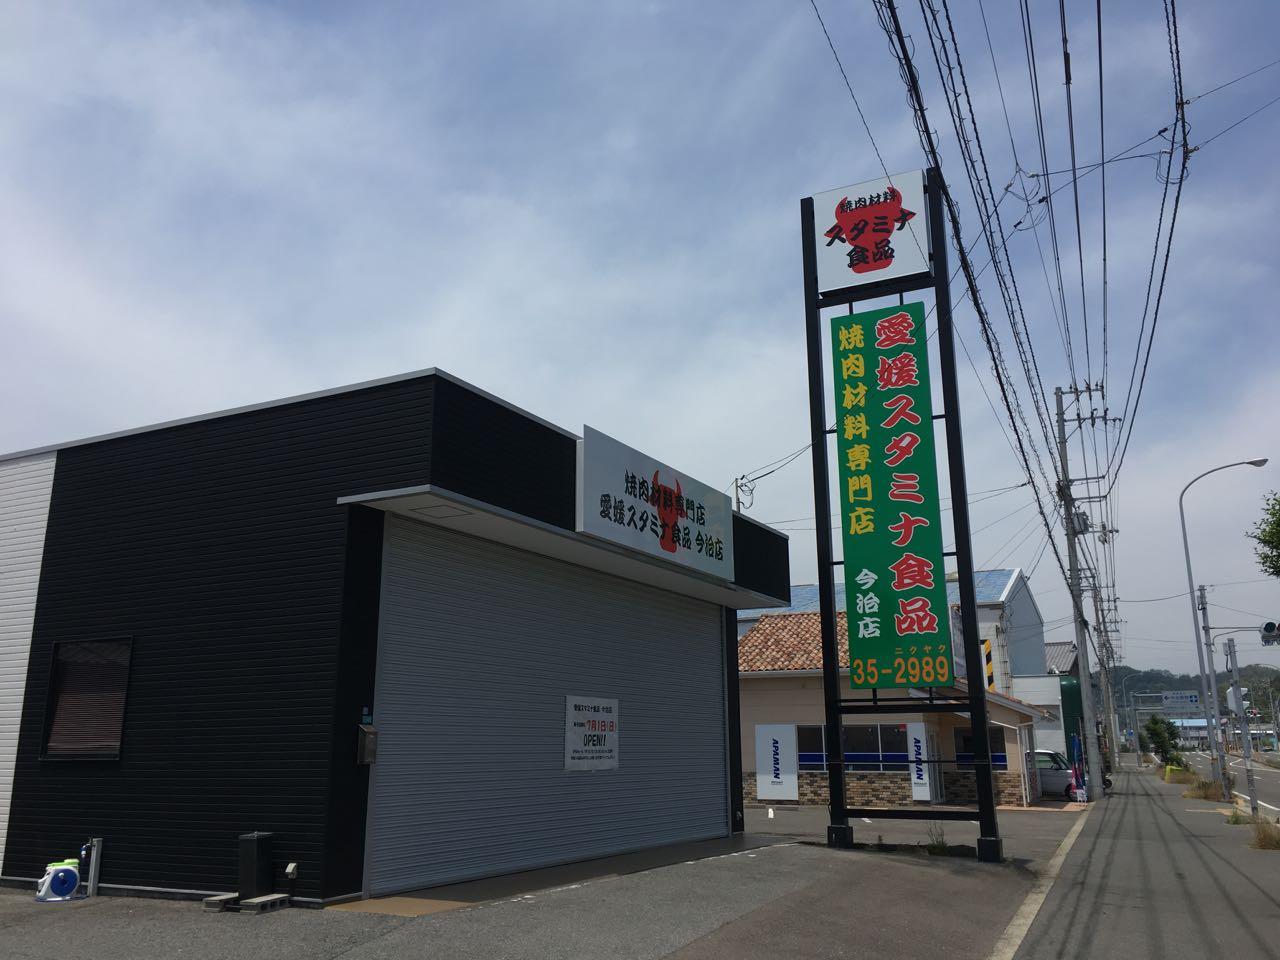 ehime, imabari, みとん今治, 今治, 愛媛, 愛媛スタミナ食品, 精肉店, 肉